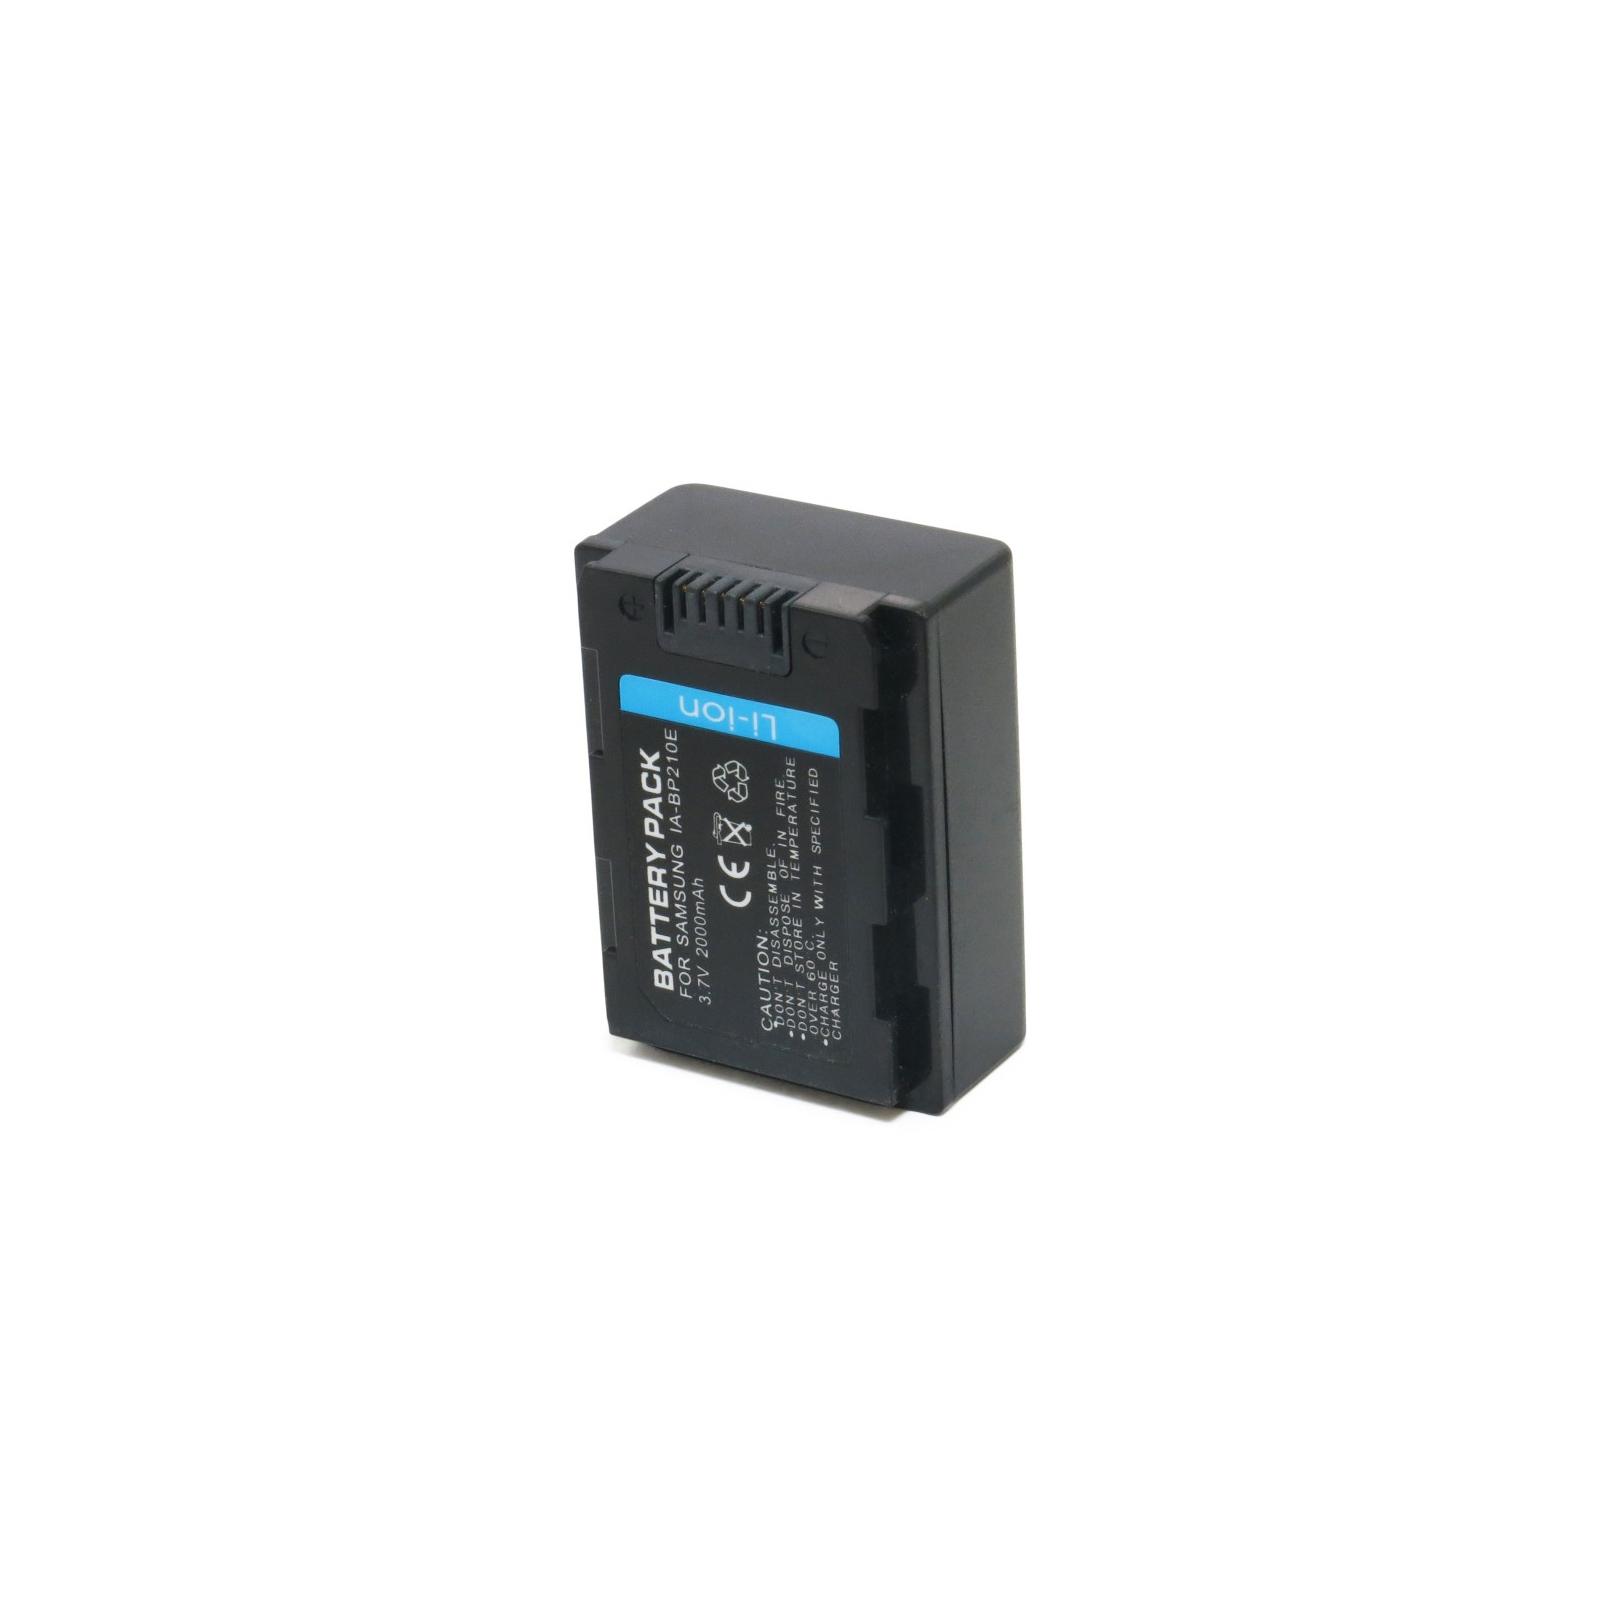 Аккумулятор к фото/видео EXTRADIGITAL Samsung IA-BP210E (DV00DV1285) изображение 5